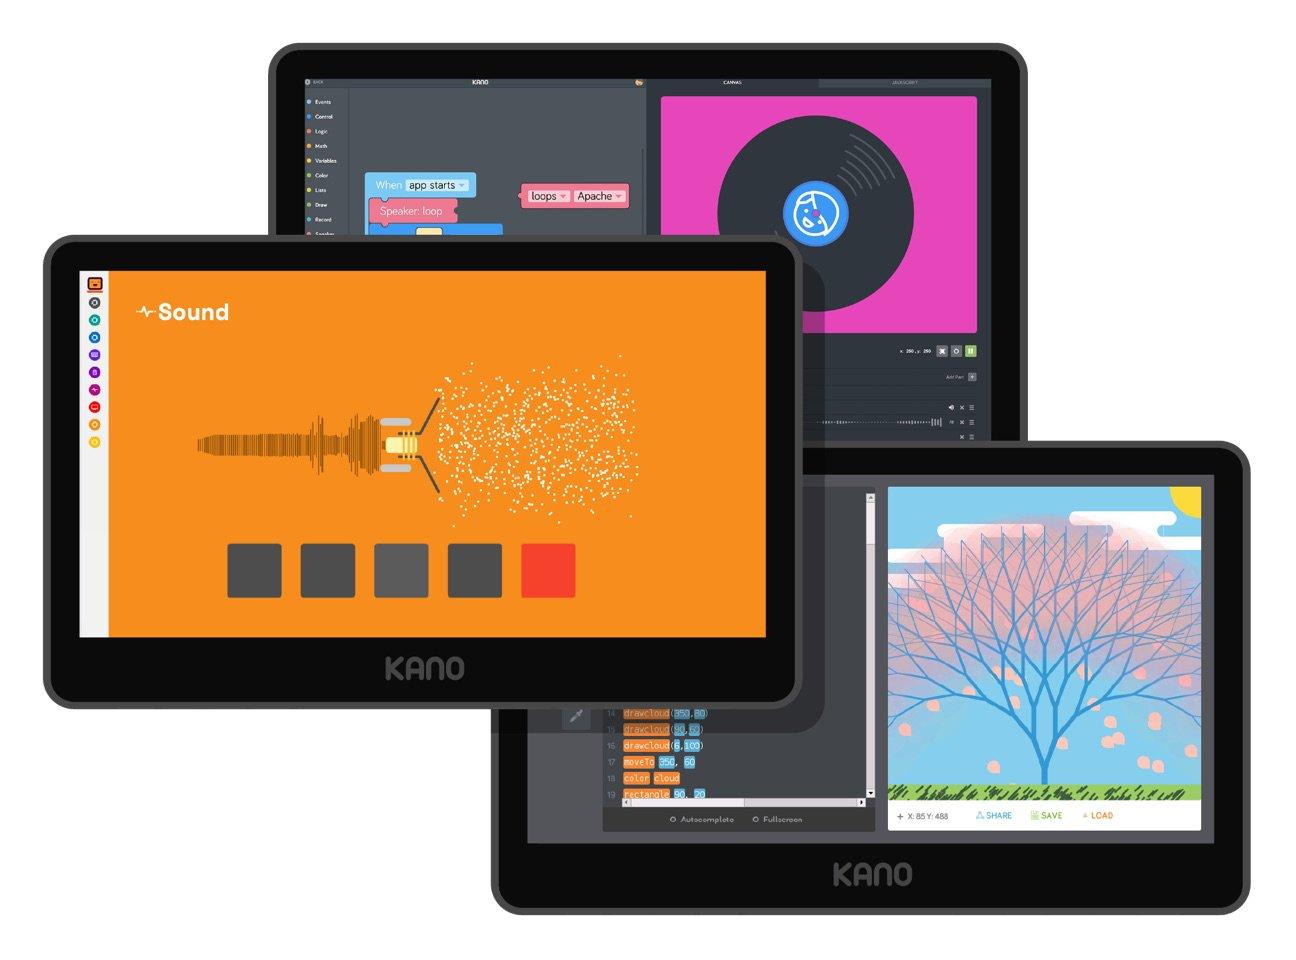 Explore your Kano PC